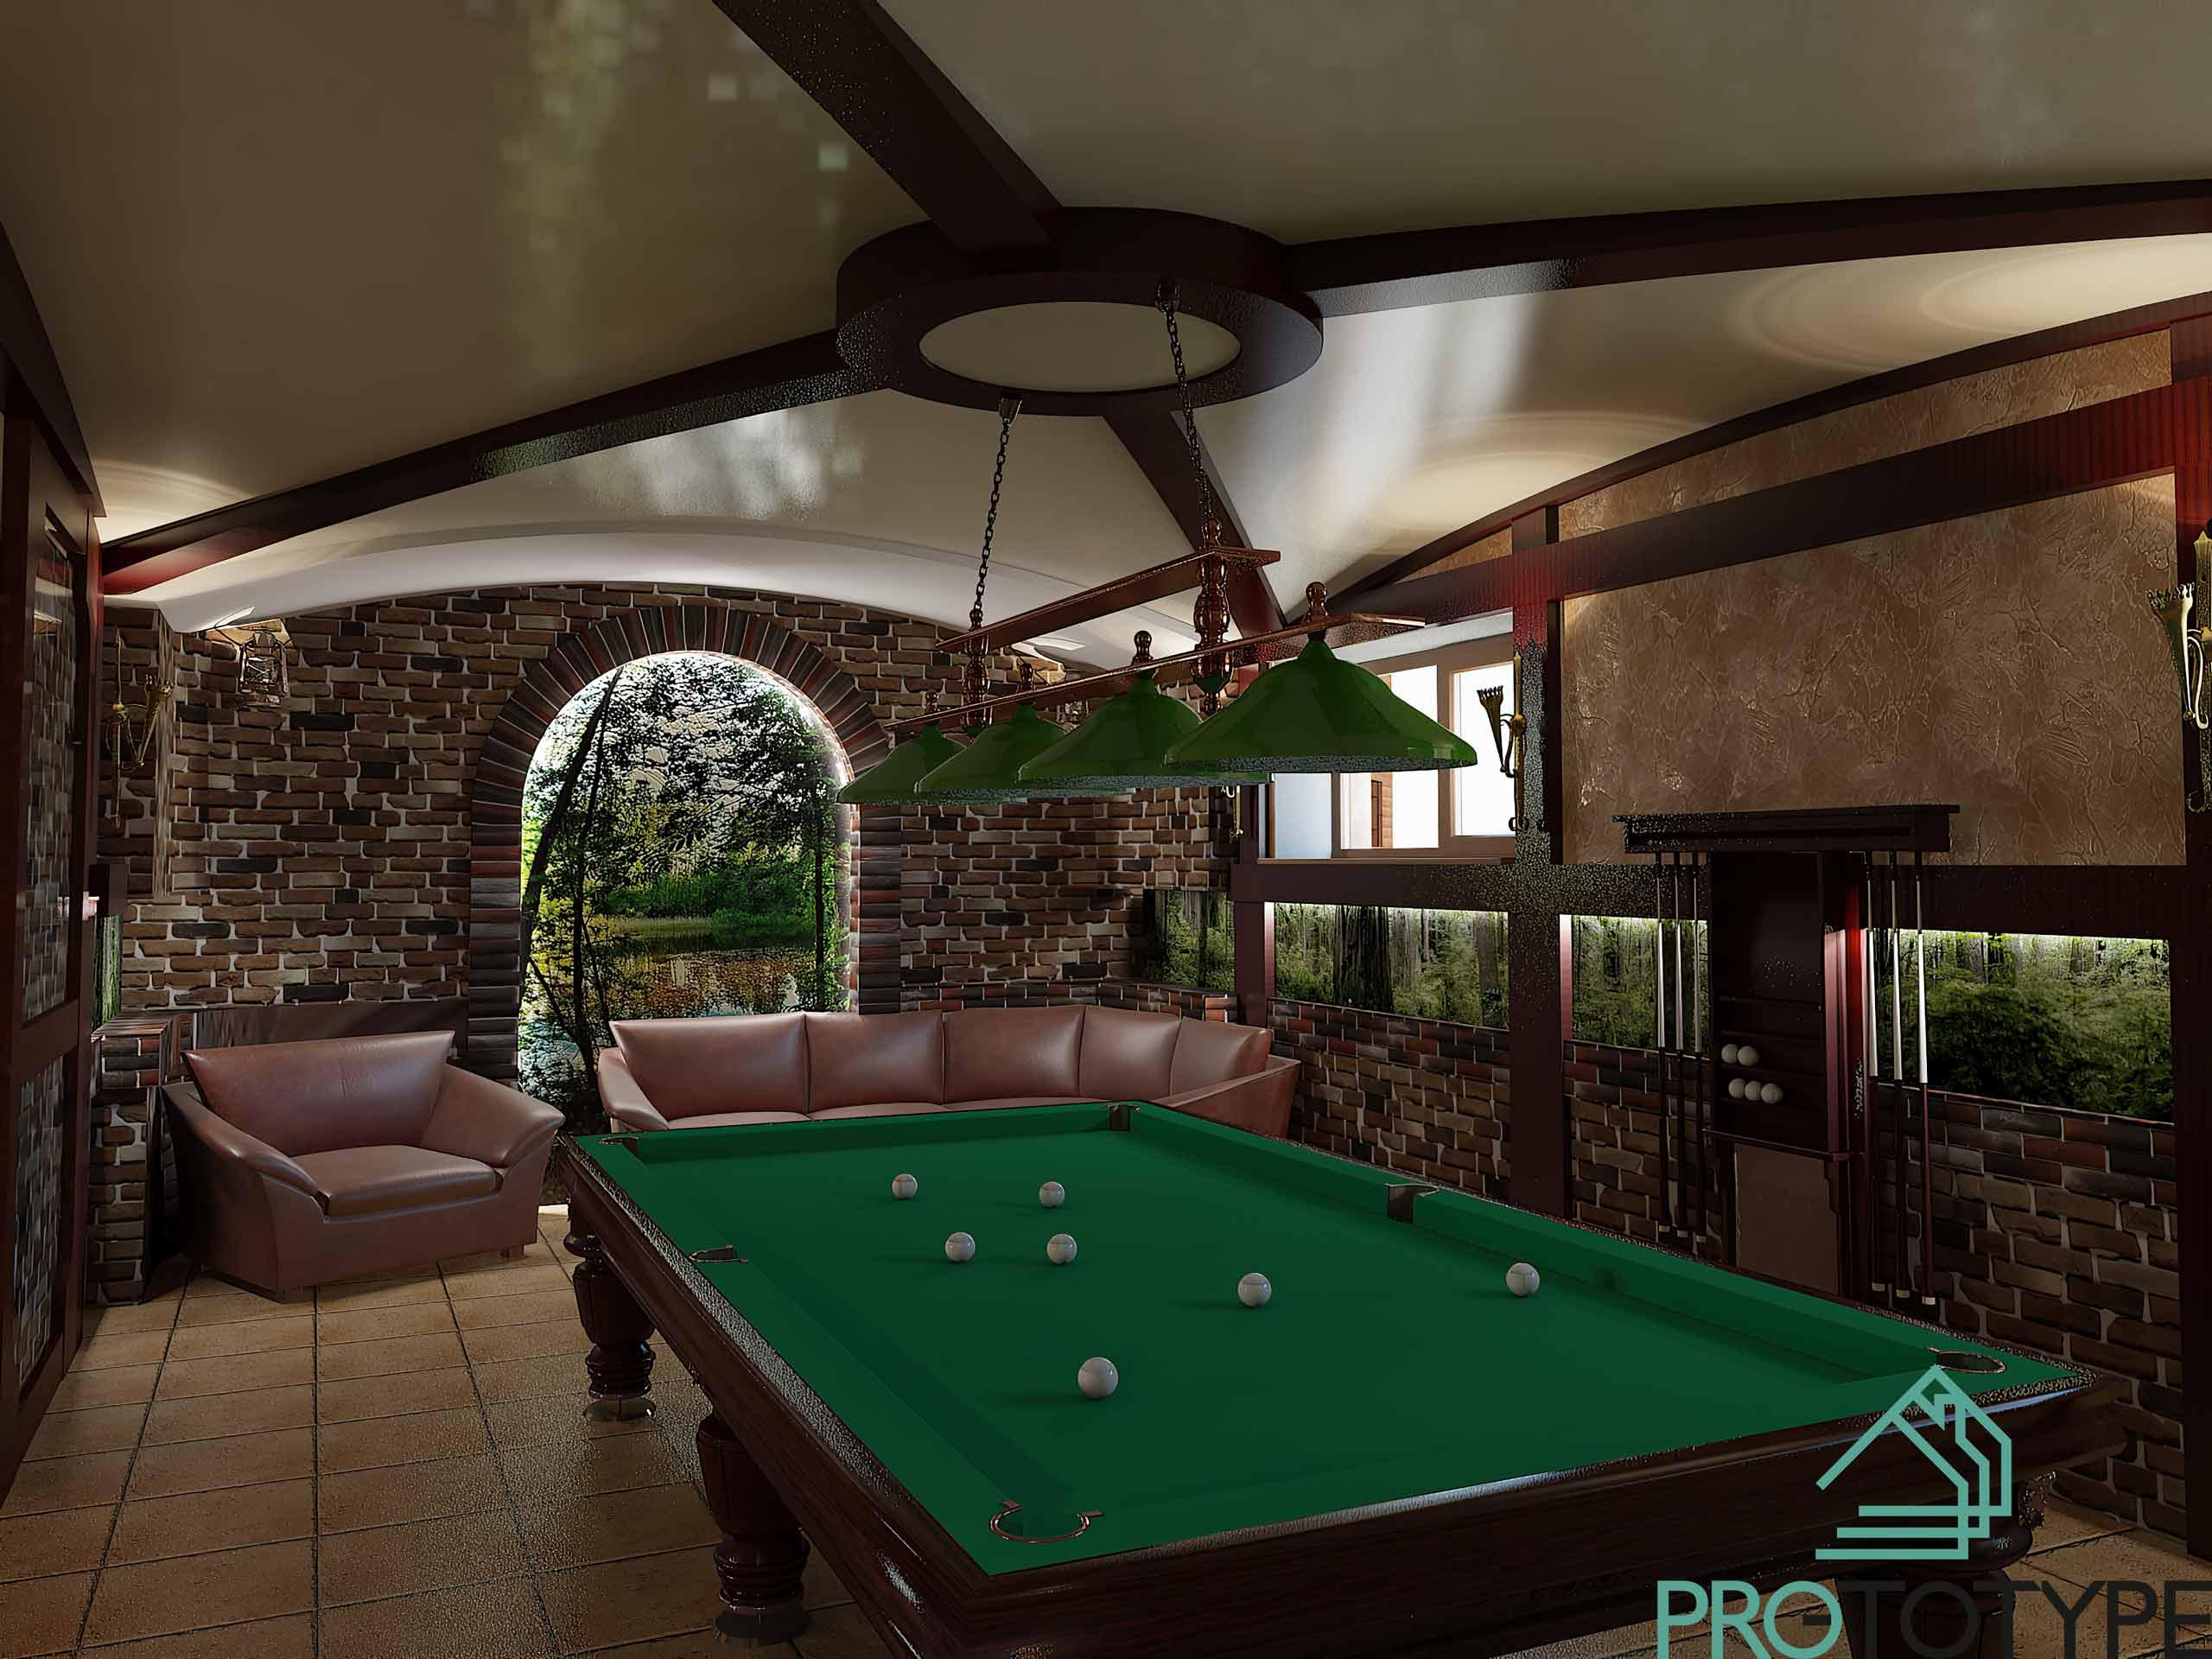 Бильярдная комната в дизайн преете частного дома